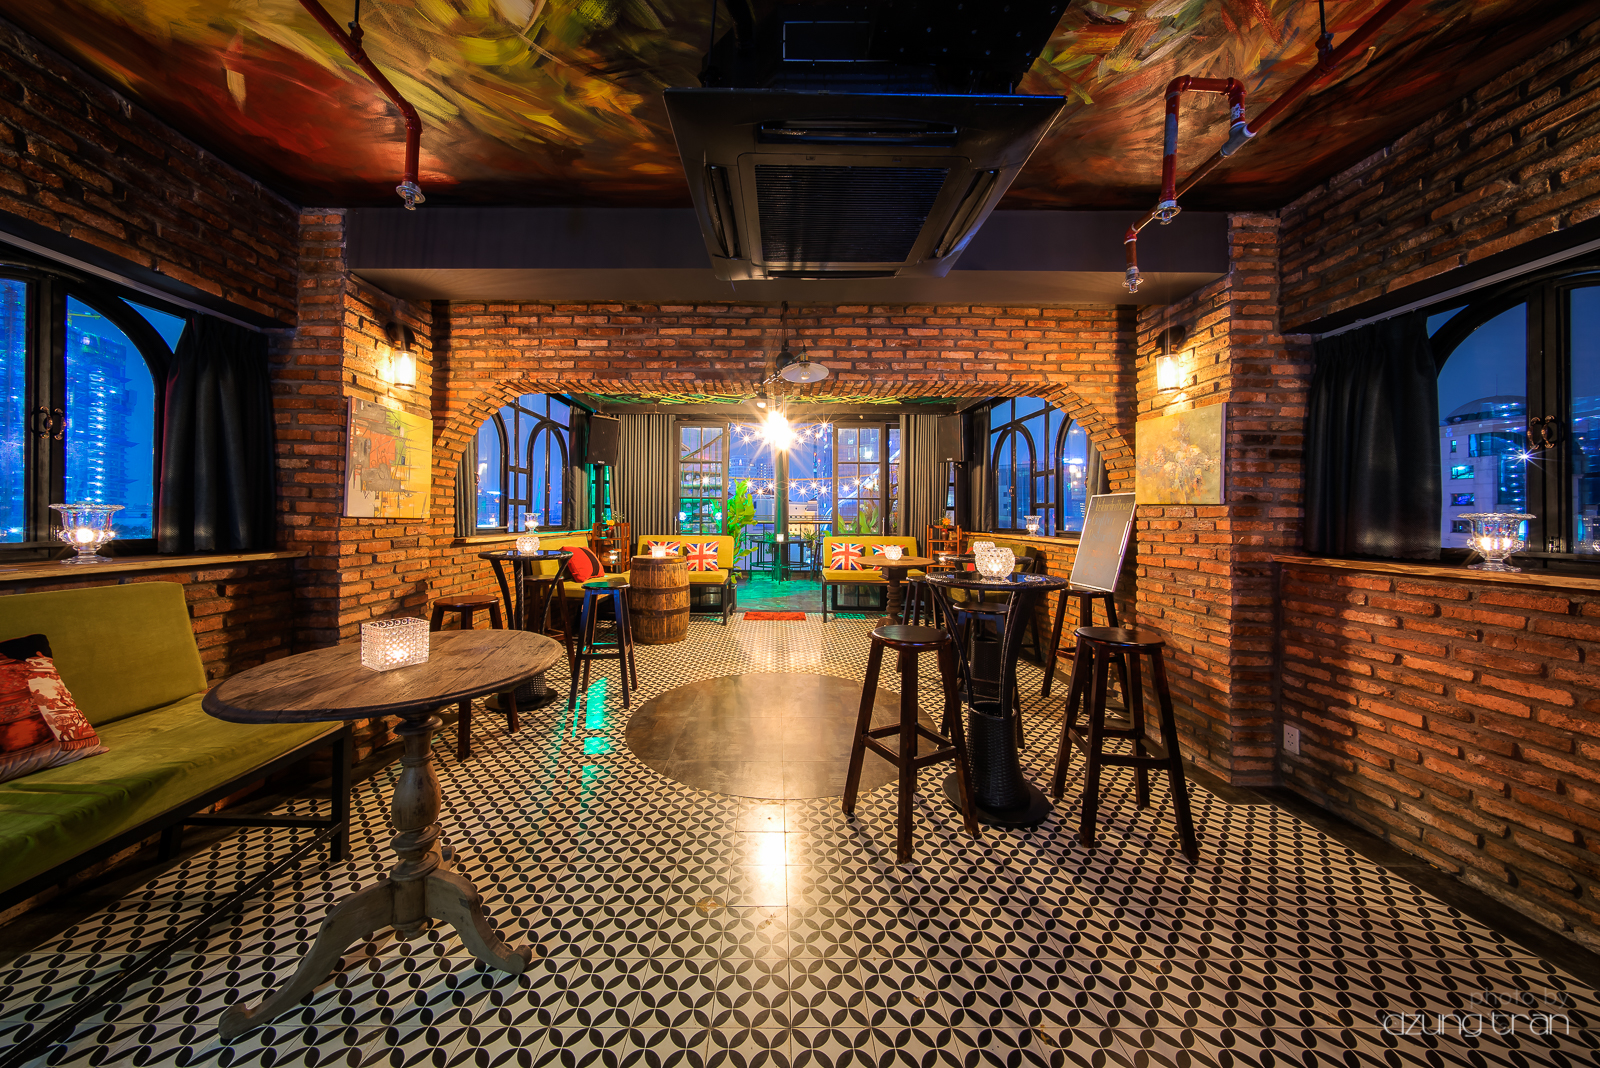 Rooftop Restaurant Interior Design : Zuma rooftop bar interior dzung tran photography